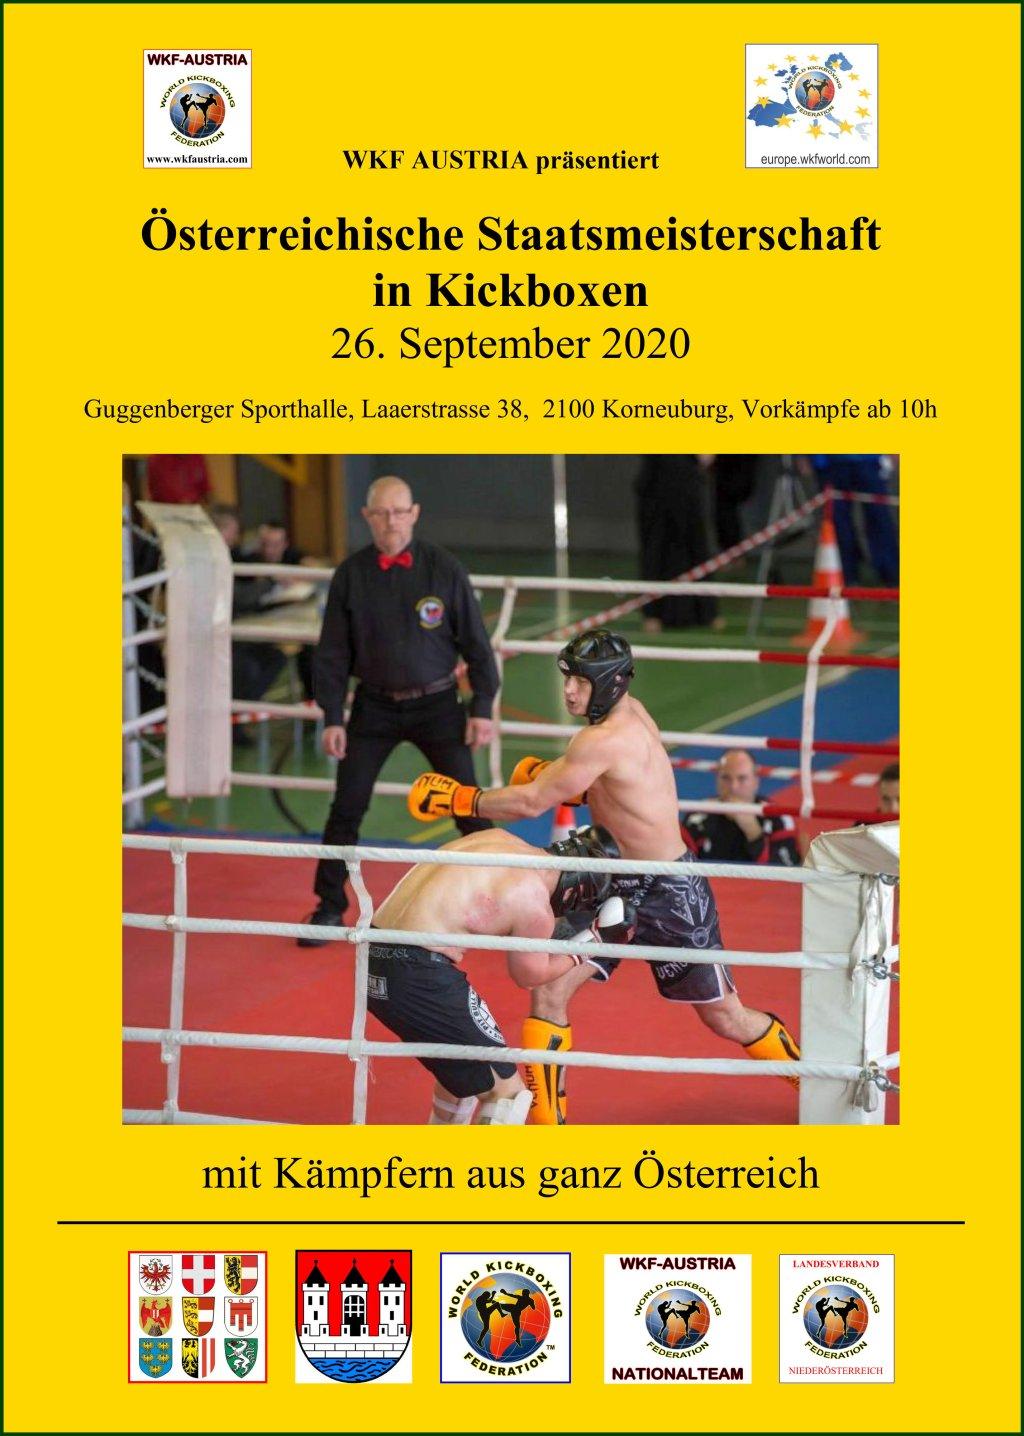 Österreichische Staatsmeisterschaften in Kickboxen am 26. September 2020